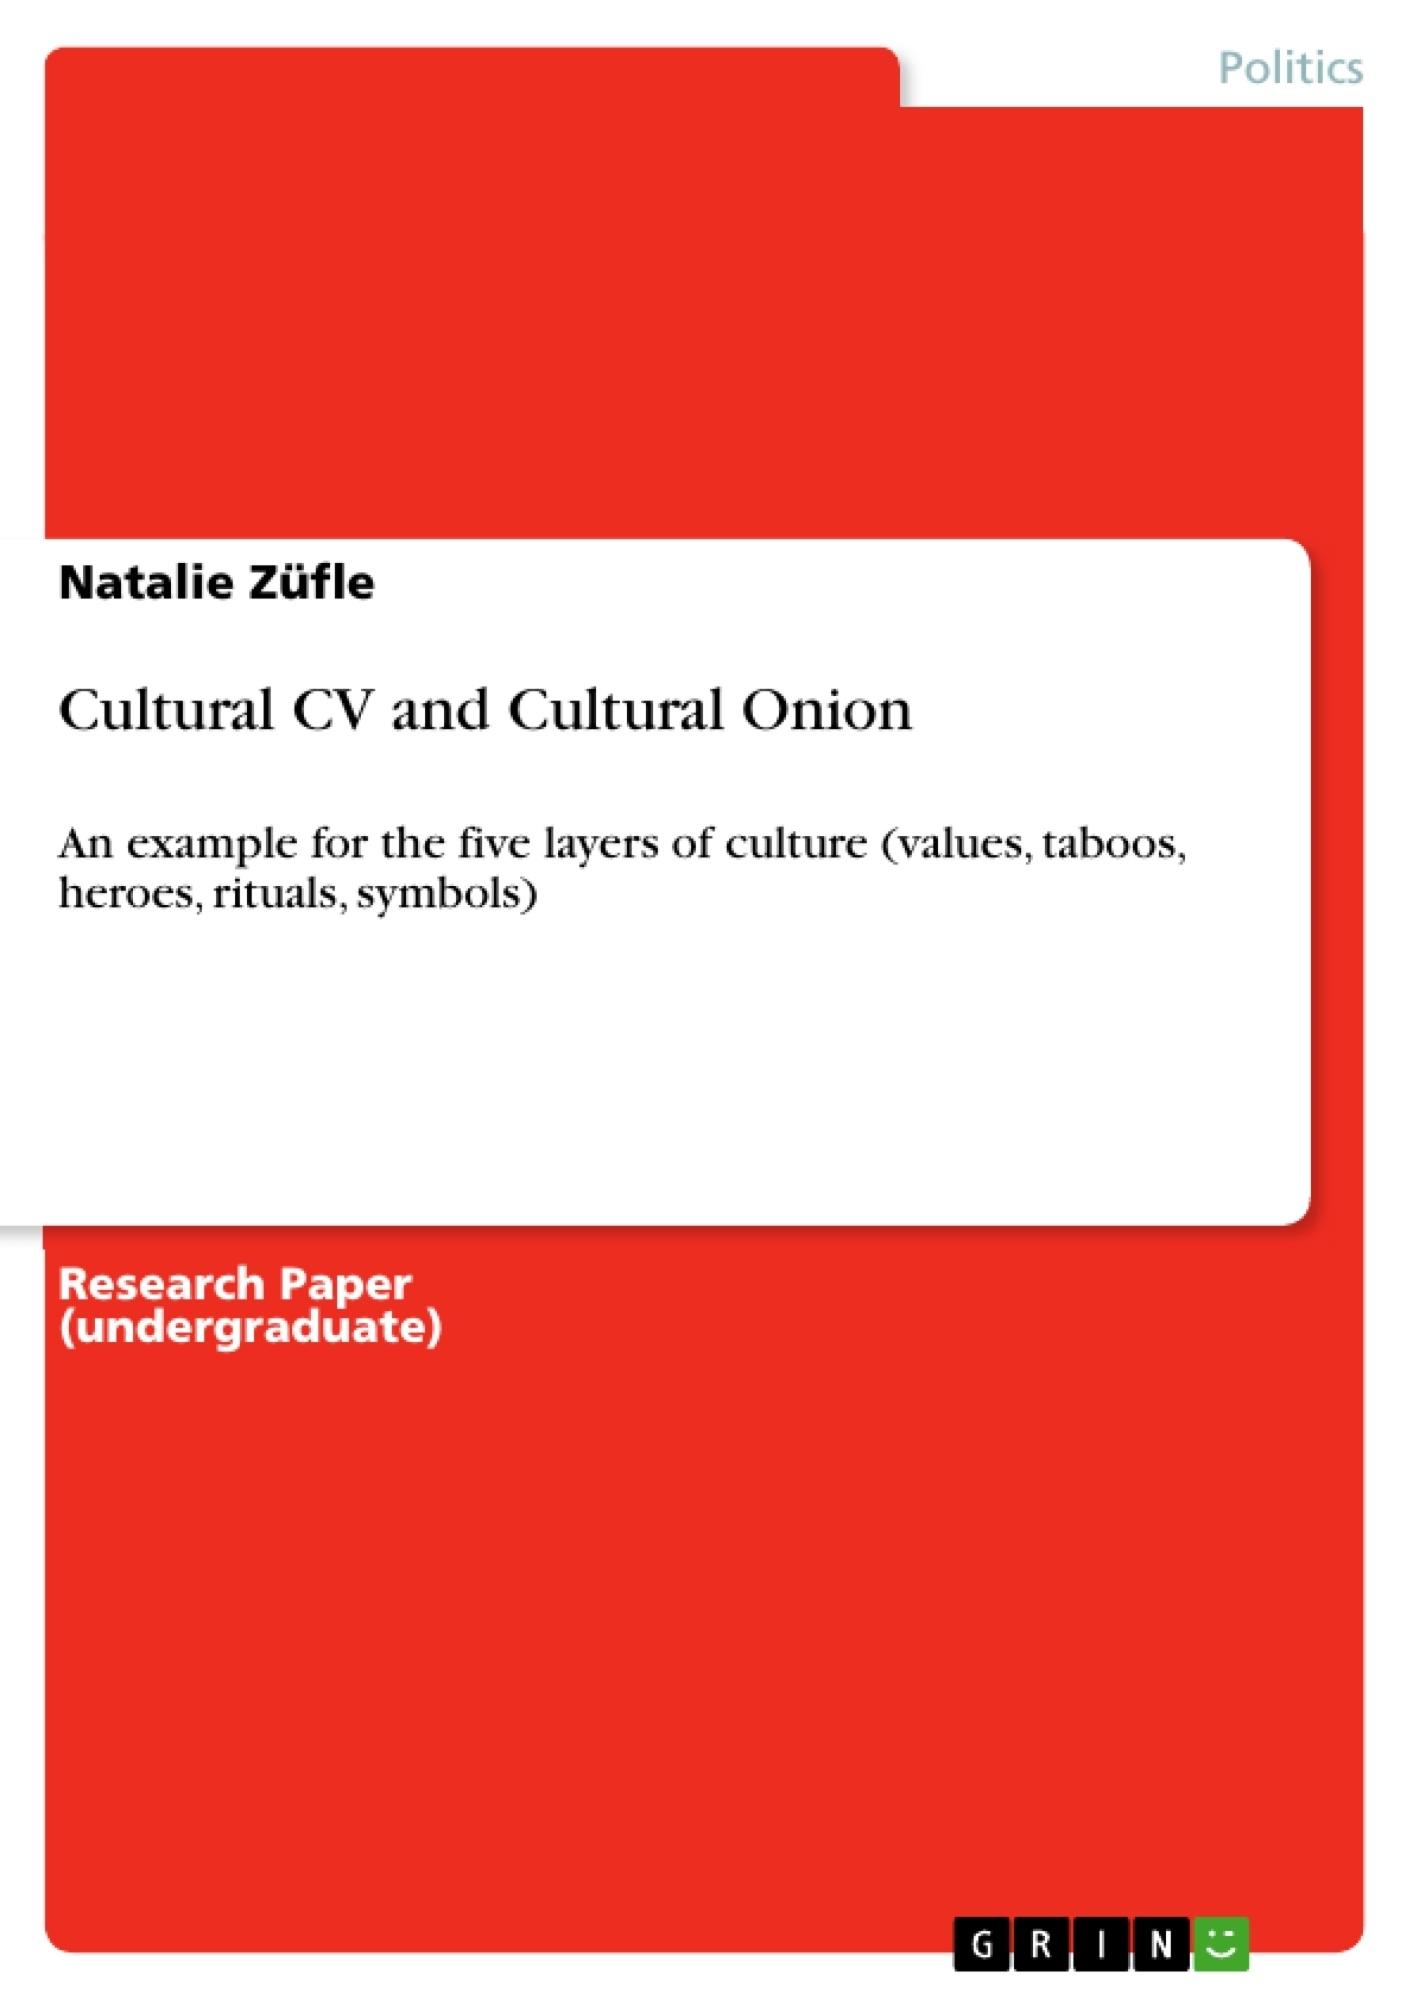 Title: Cultural CV and Cultural Onion